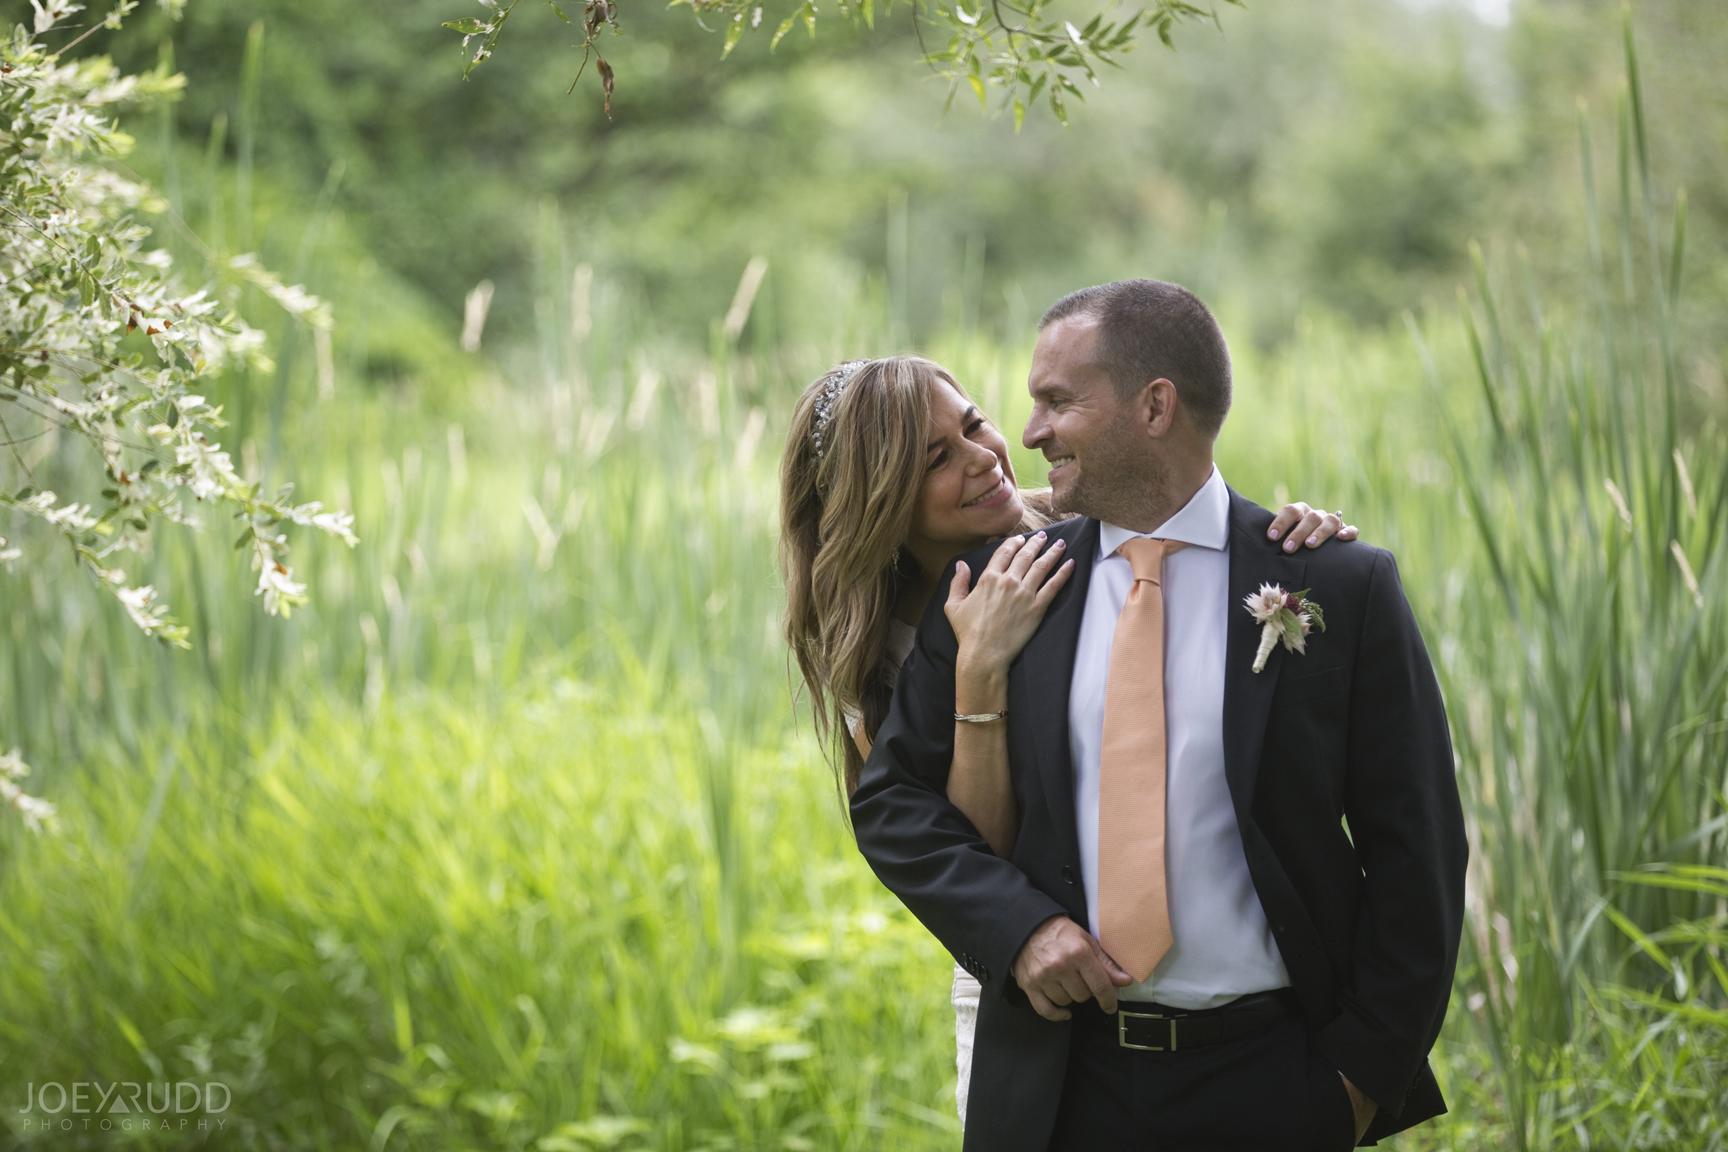 Elopement Wedding by Ottawa Wedding Photographer Joey Rudd Photography Arboretum Creek